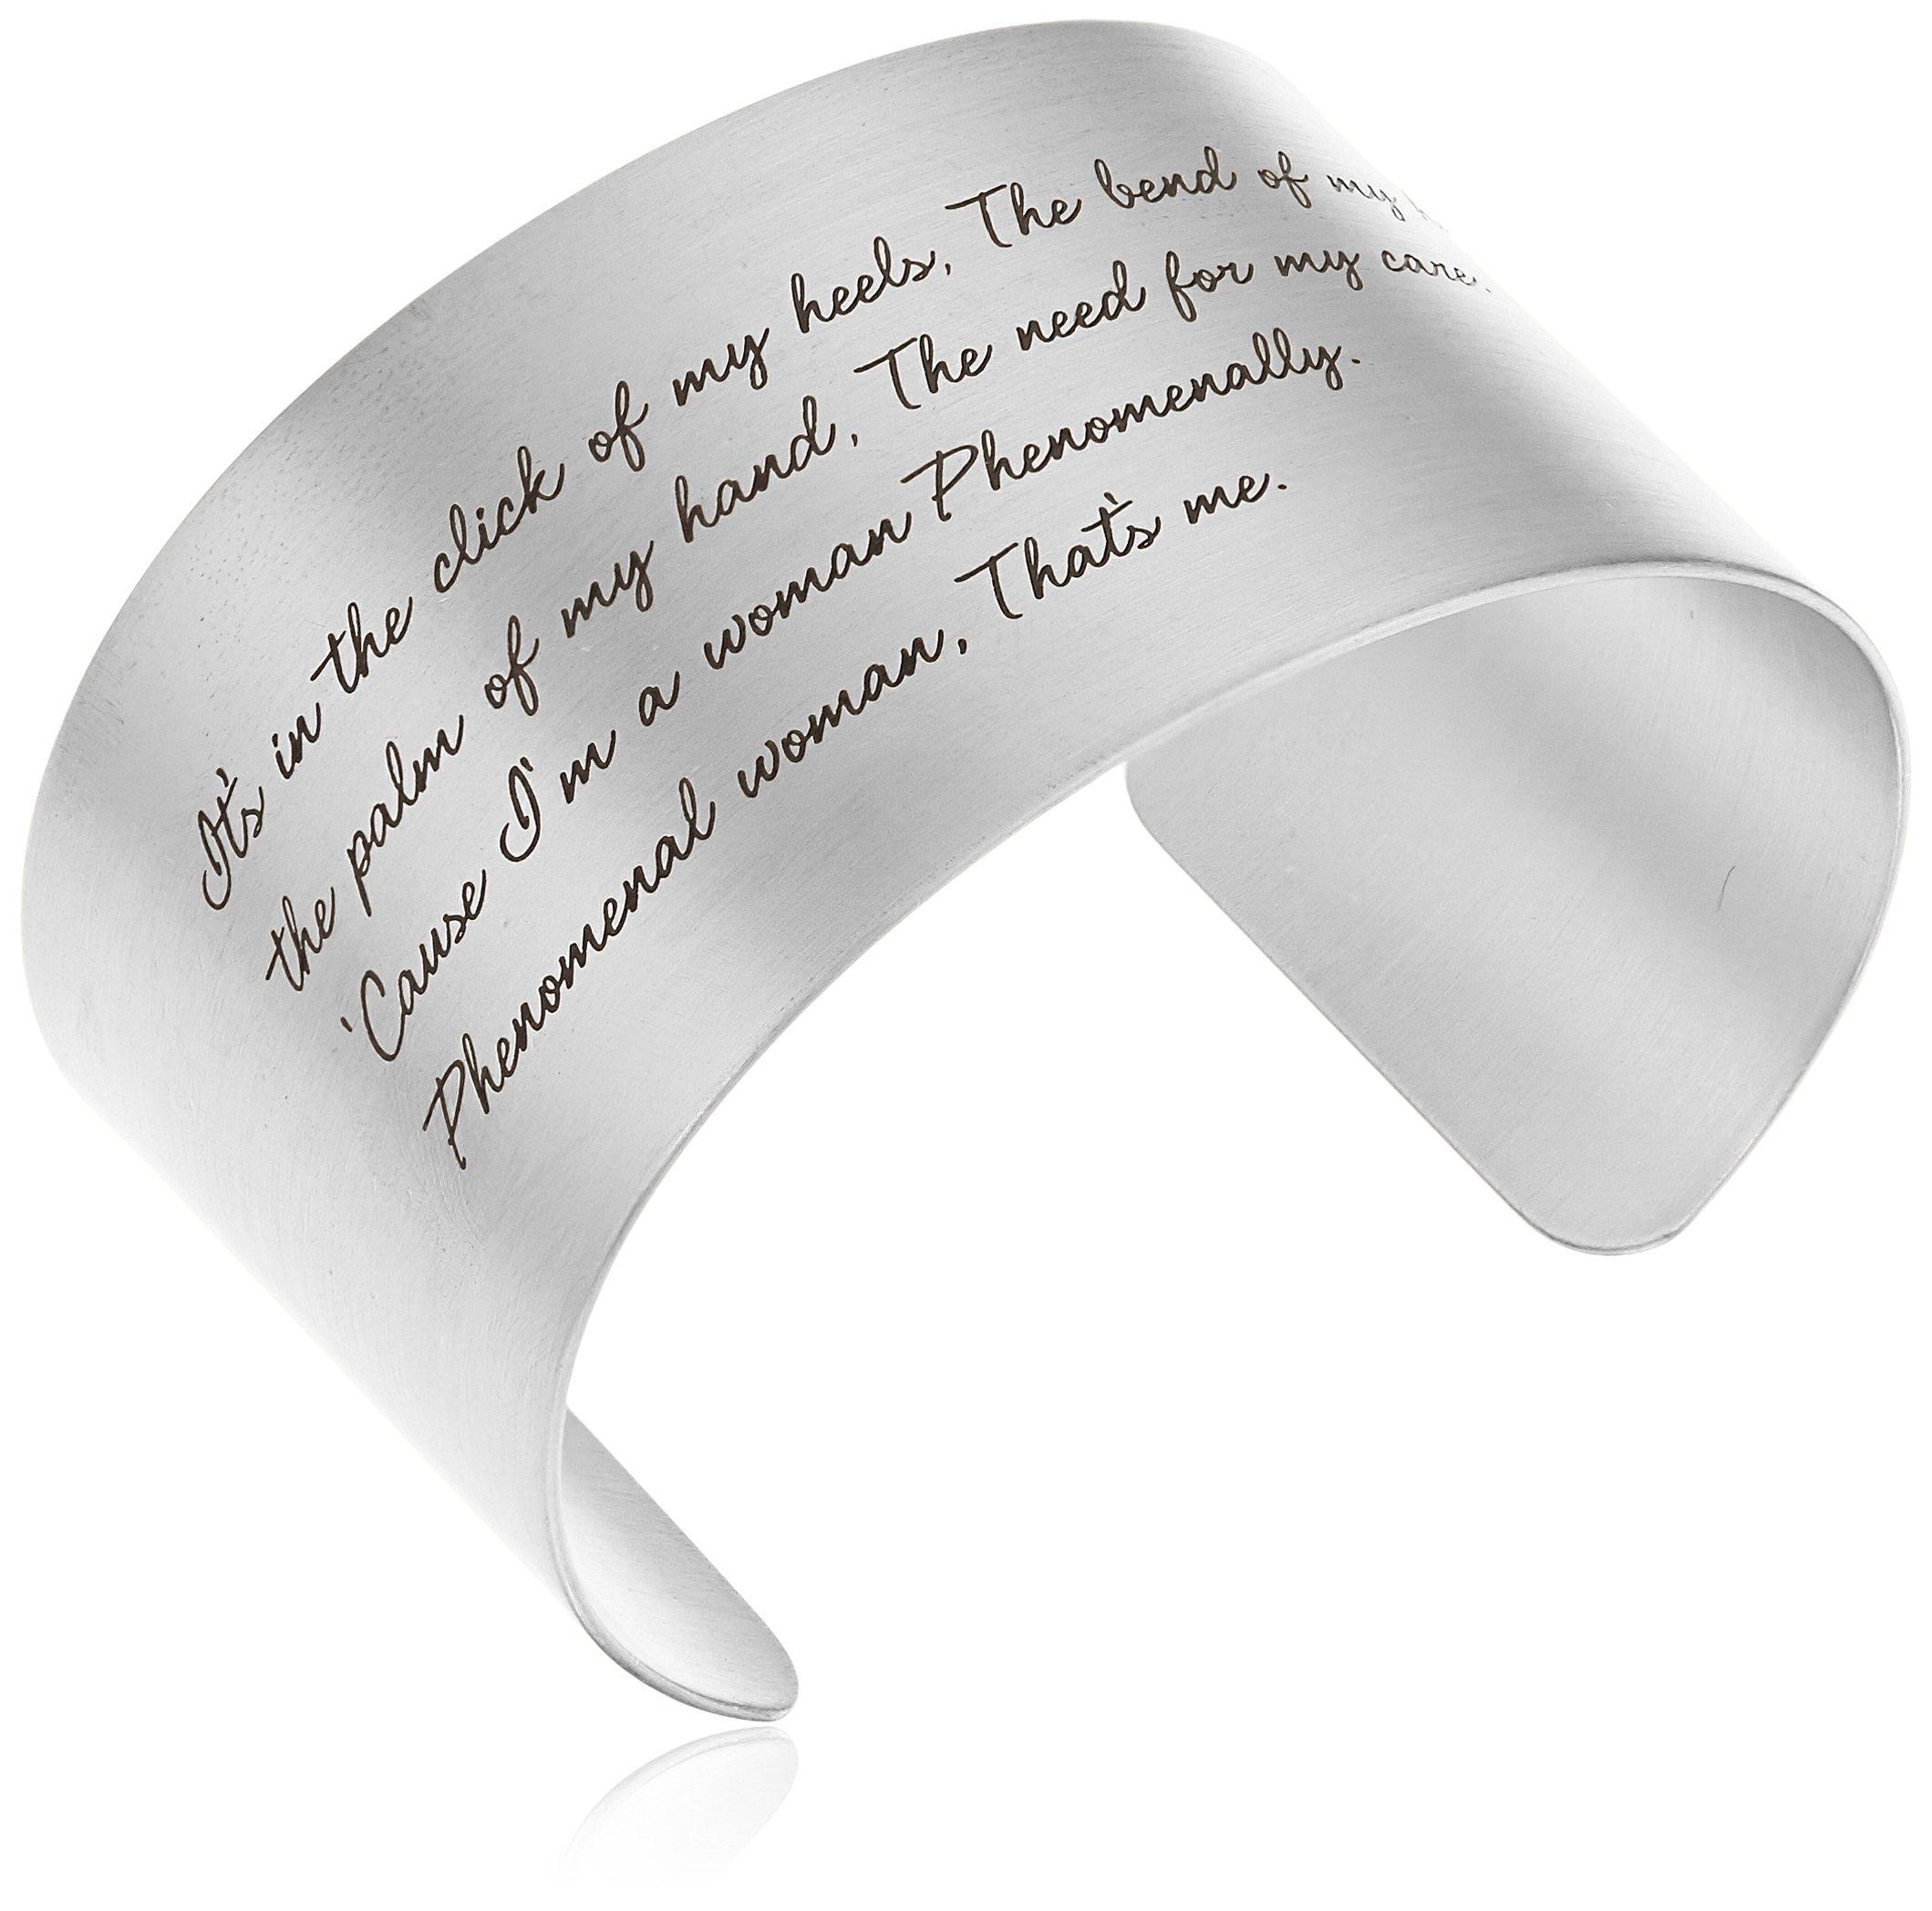 Dogeared ''Maya Angelou'' Phenomenal Woman Large Engraved Sterling Silver Cuff Bracelet